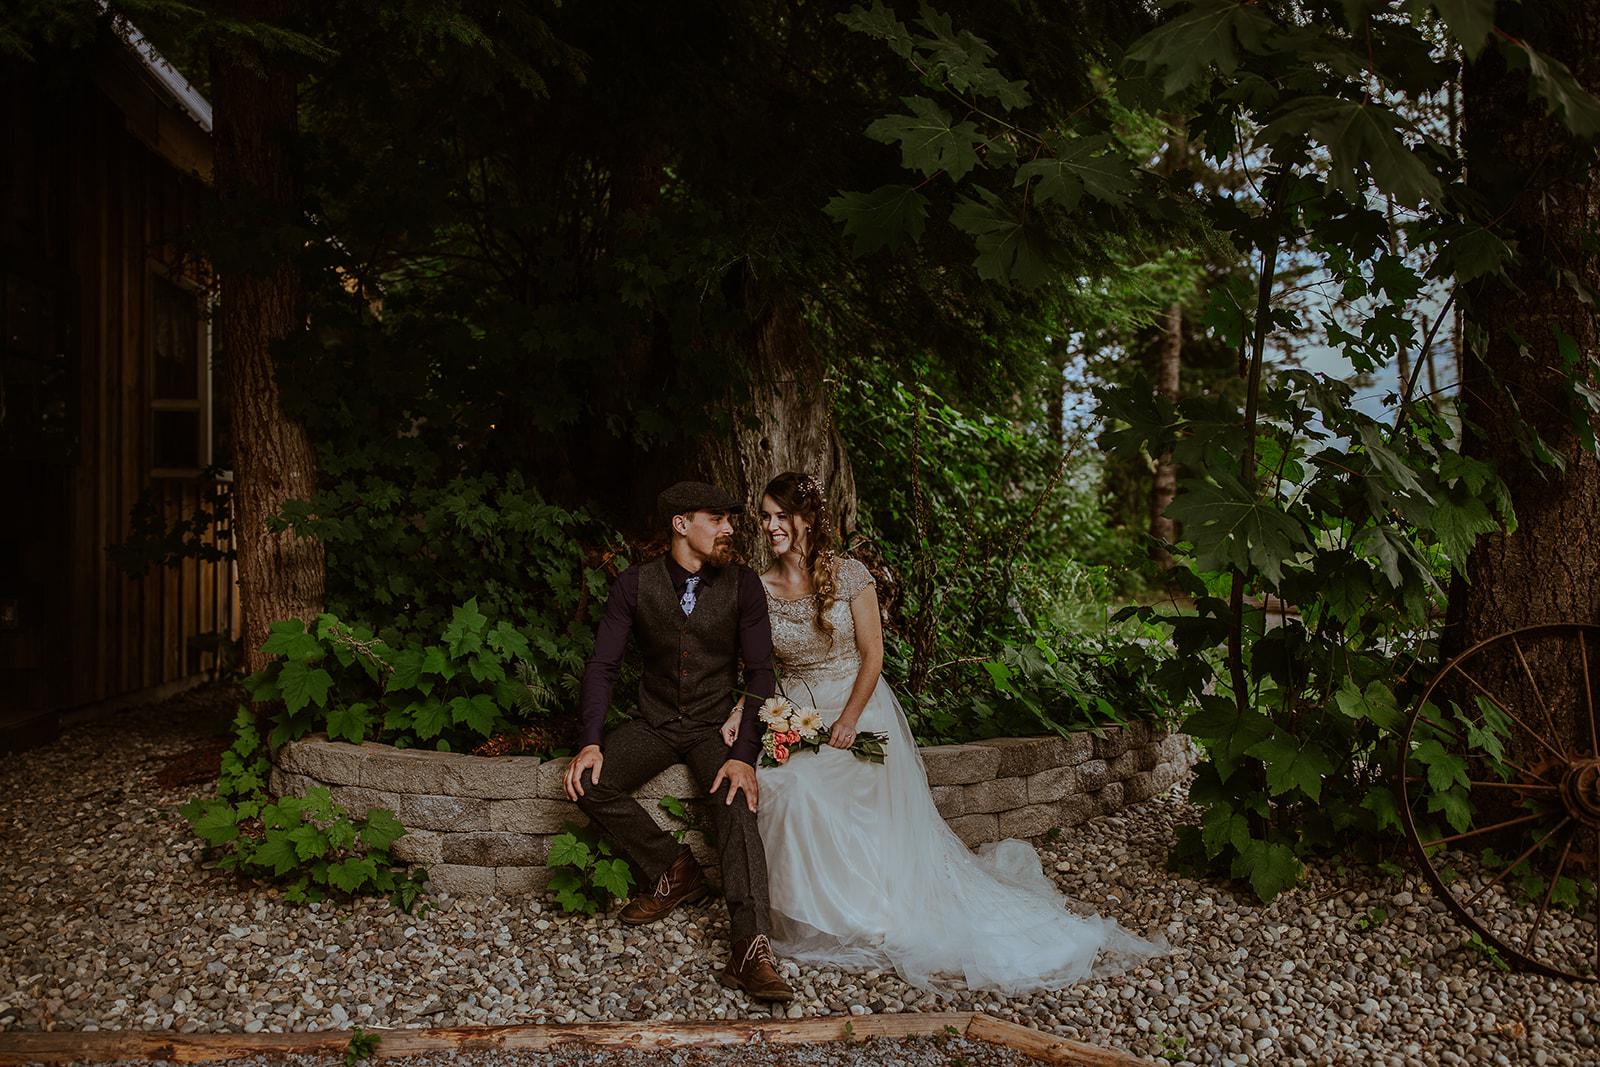 mount-rainier-cabin-elopement-megan-gallagher-photography_(189_of_568).jpg